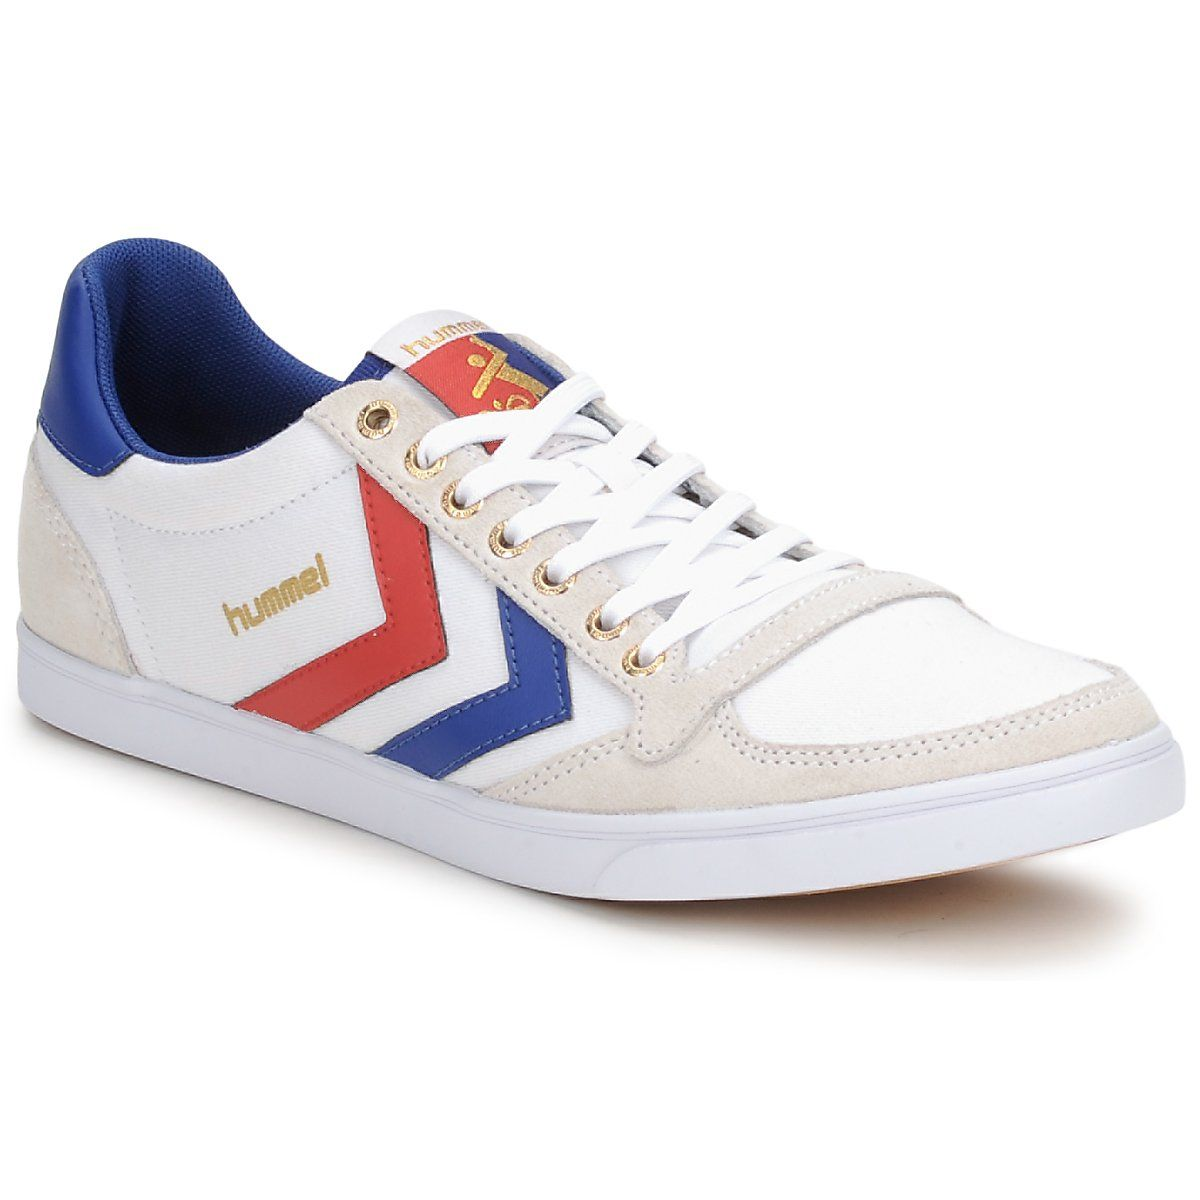 canvasGet Ten star low star Ten low dressedSneakersShoesCanvas canvasGet dressedSneakersShoesCanvas qVMSpUz